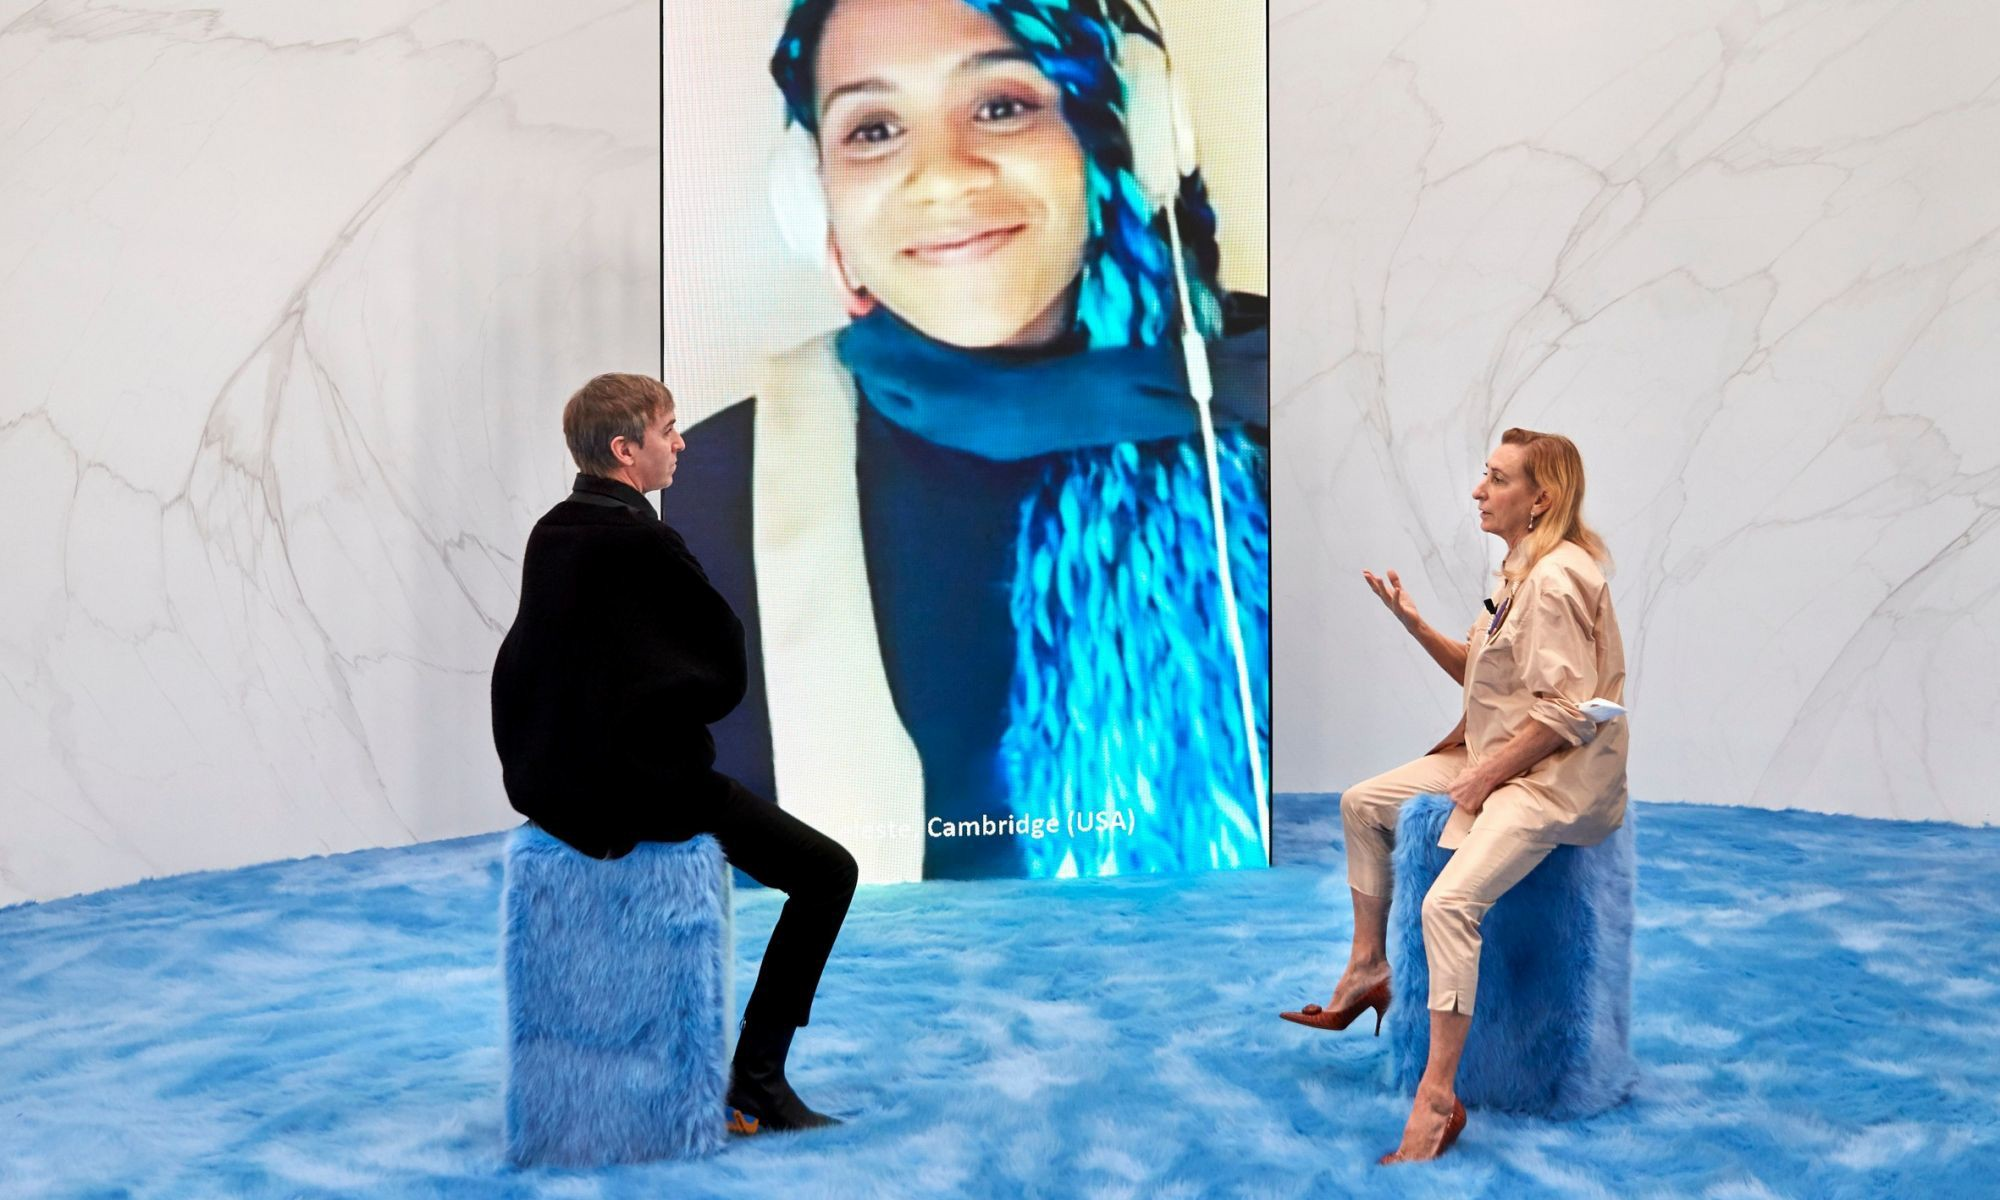 Miuccia Prada 与 Raf Simons 将在新季女装秀后再度展开对话环节